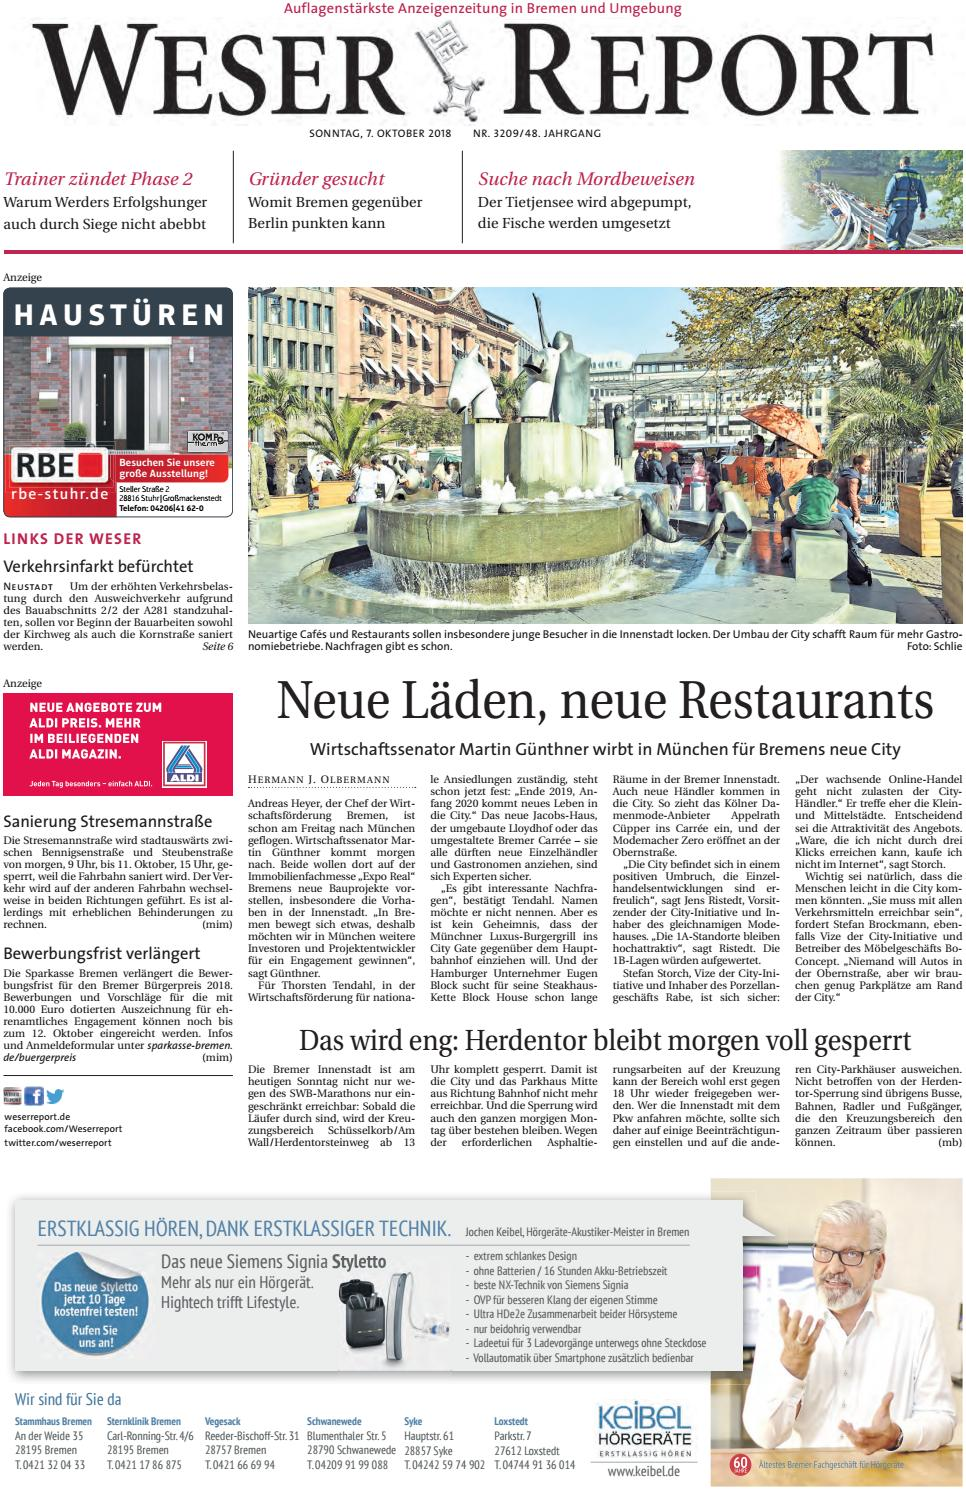 Weser Report - Links der Weser vom 07.10.2018 by KPS ...